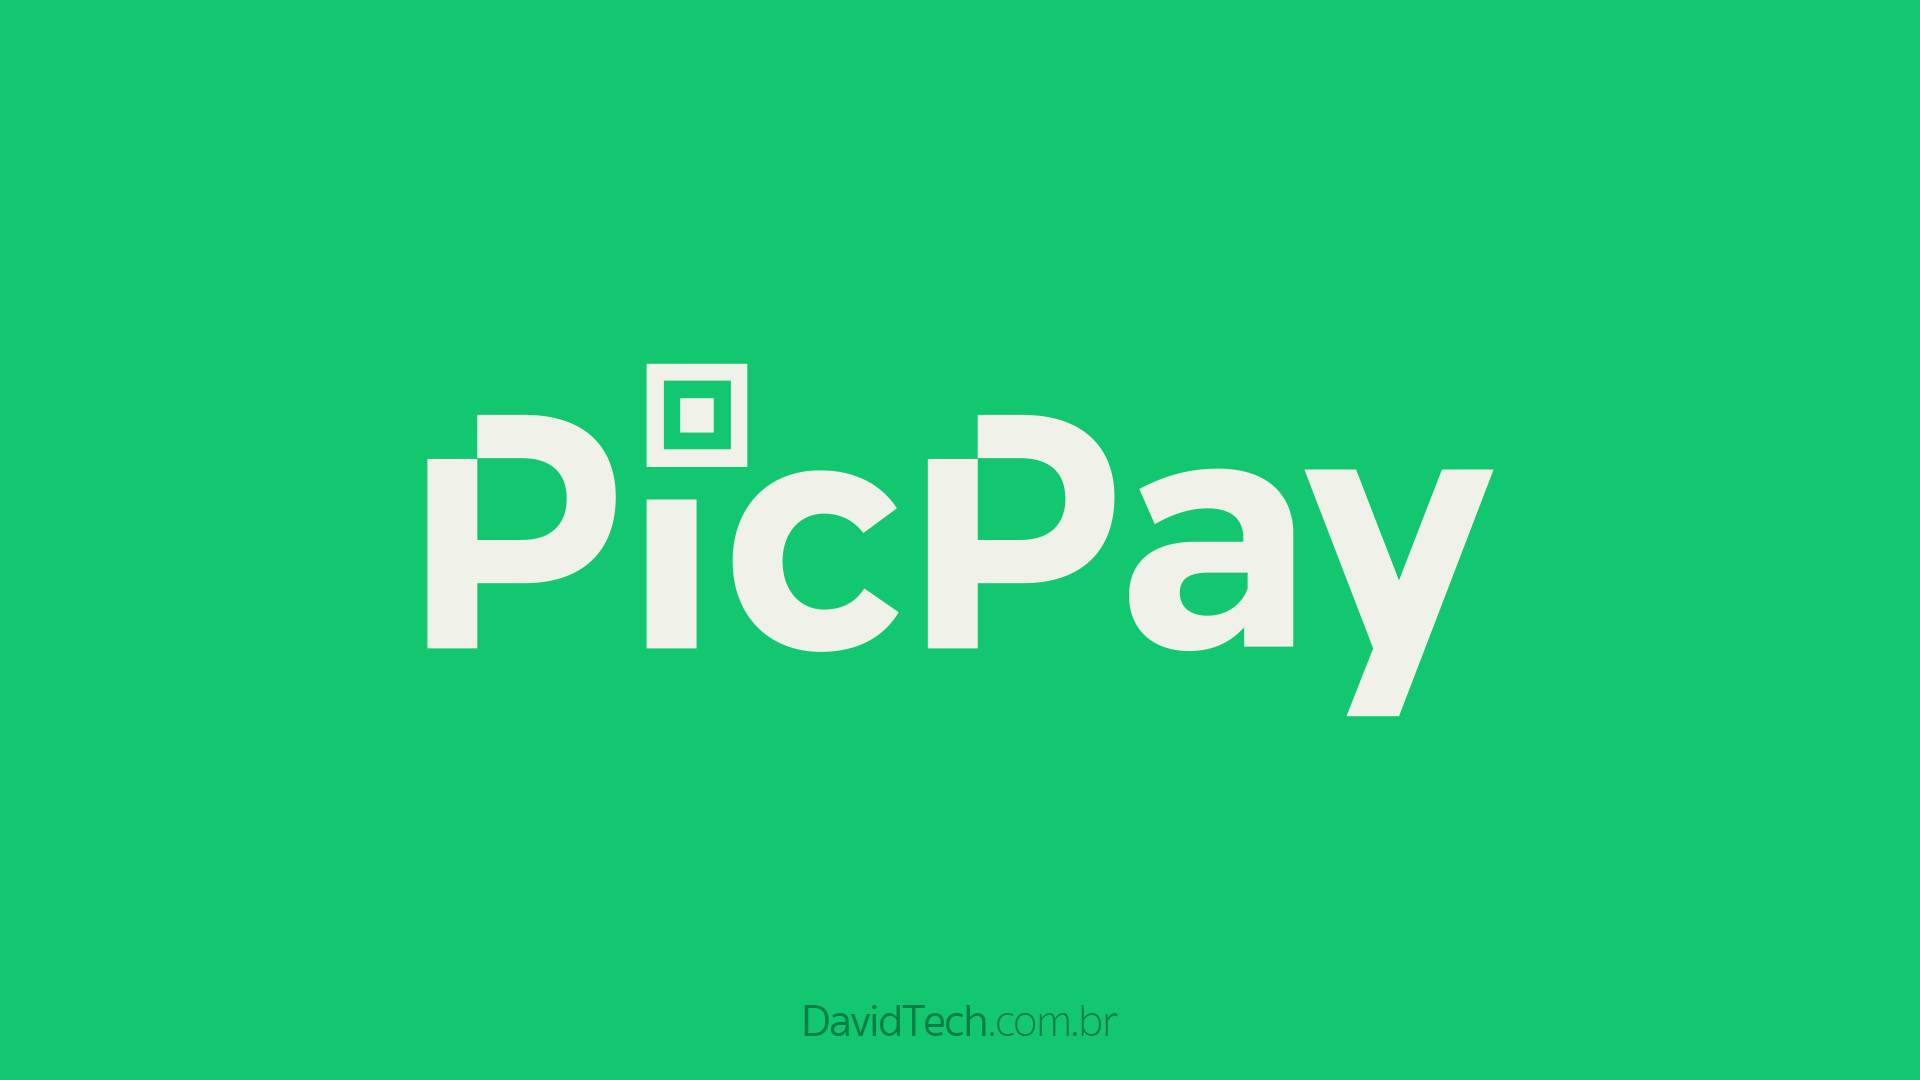 picpay aplicativo de pagamentos